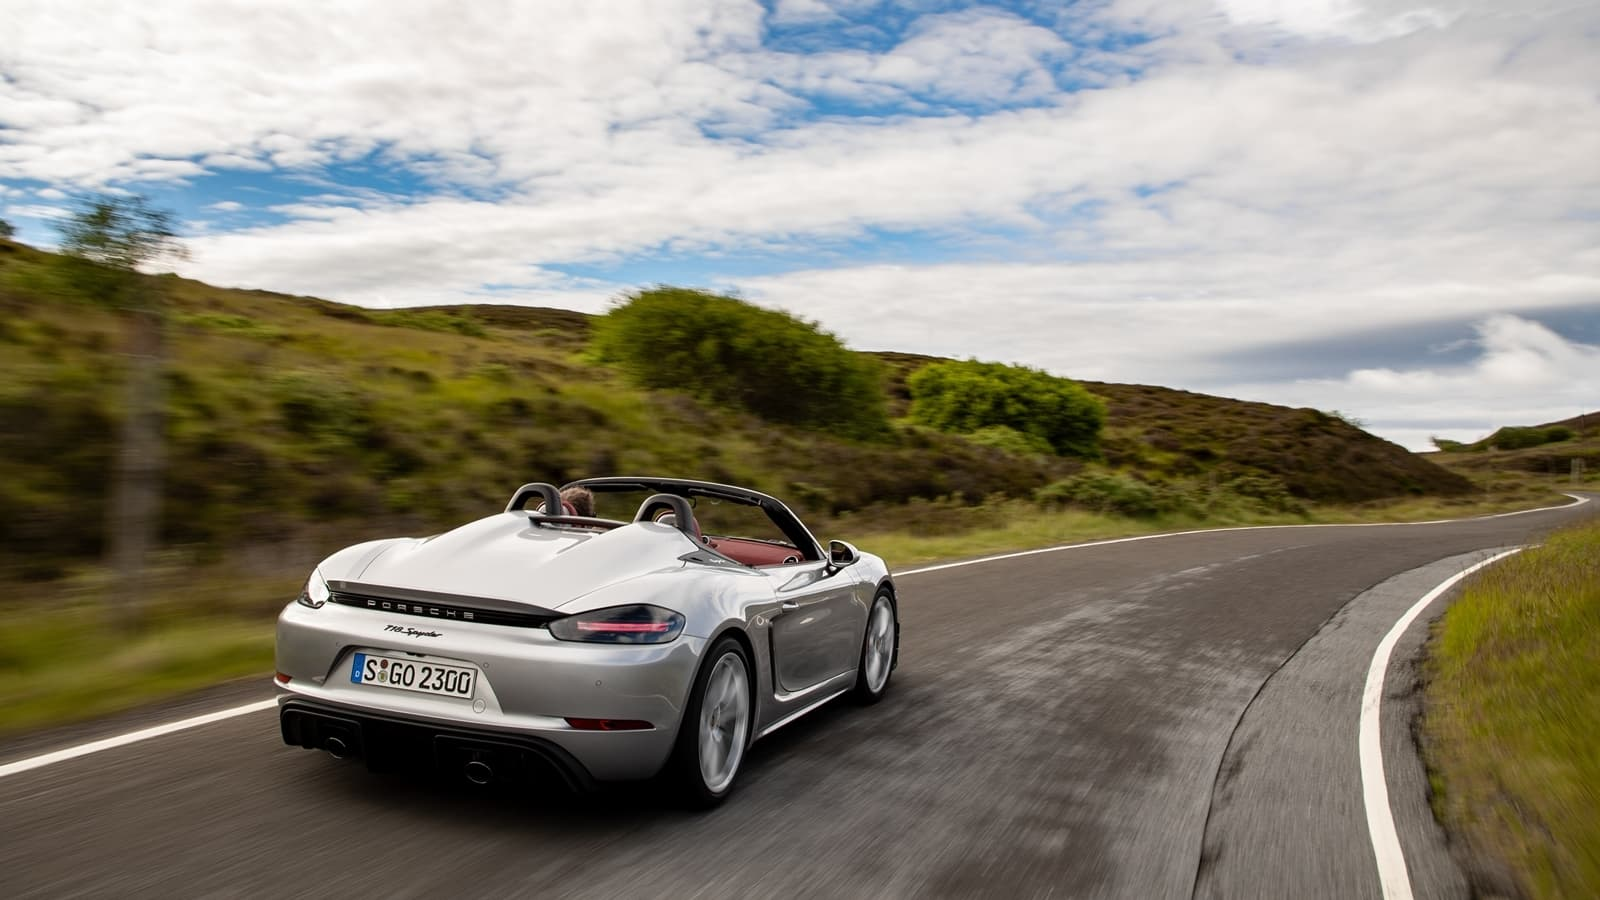 Porsche 718 Spyder 0719 038